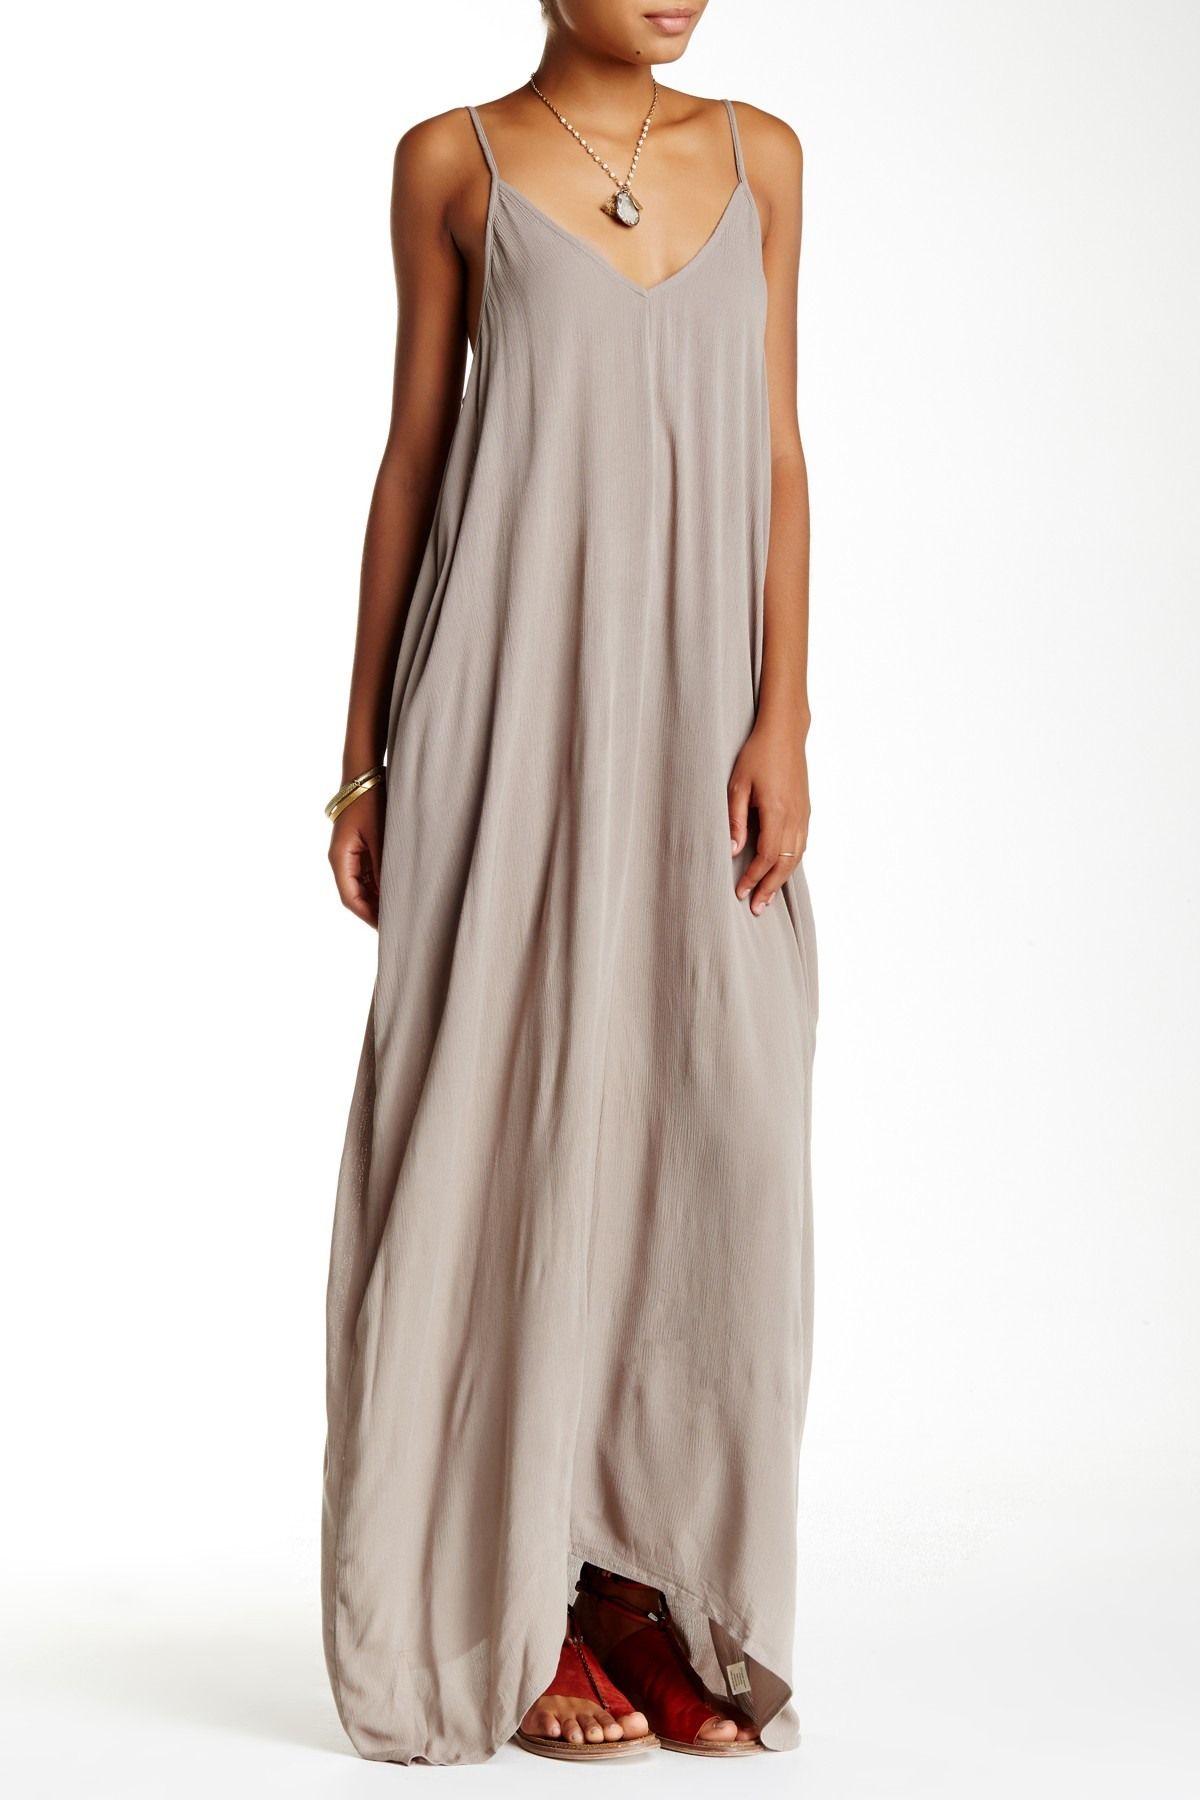 Gauze Maxi Dress | Style | Pinterest | Maxi dresses, Nordstrom and ...